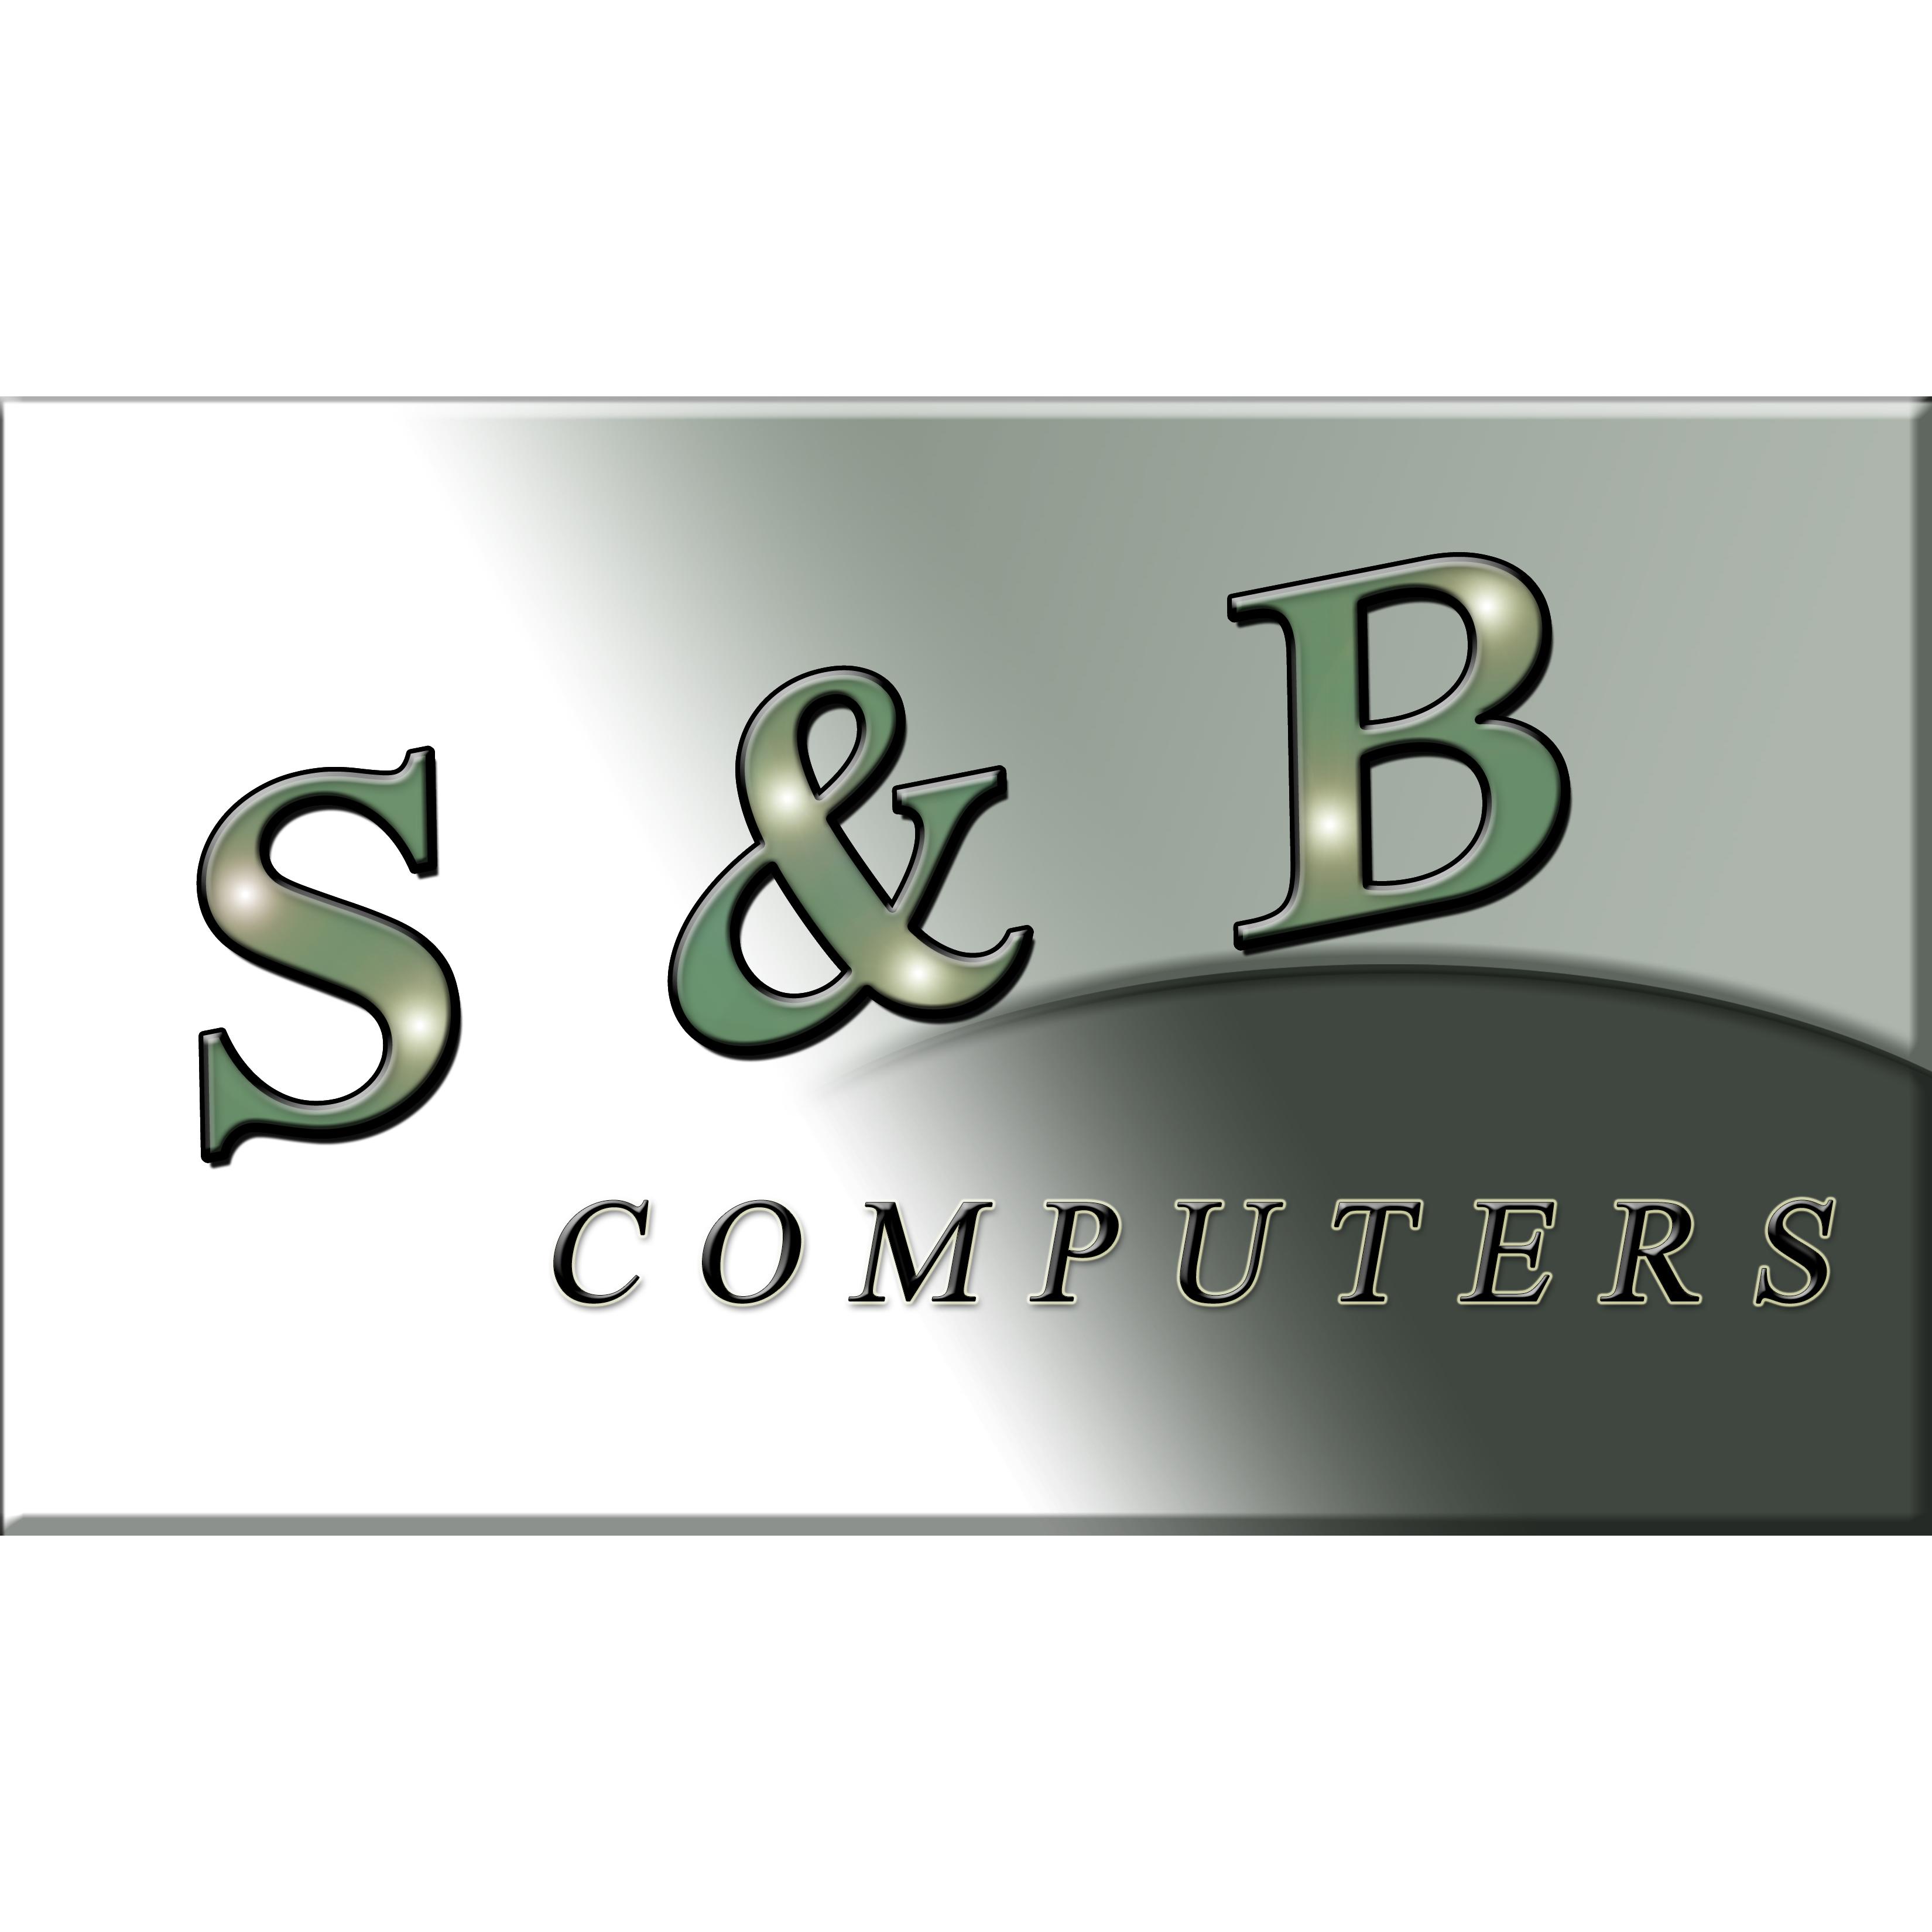 S&B Computers